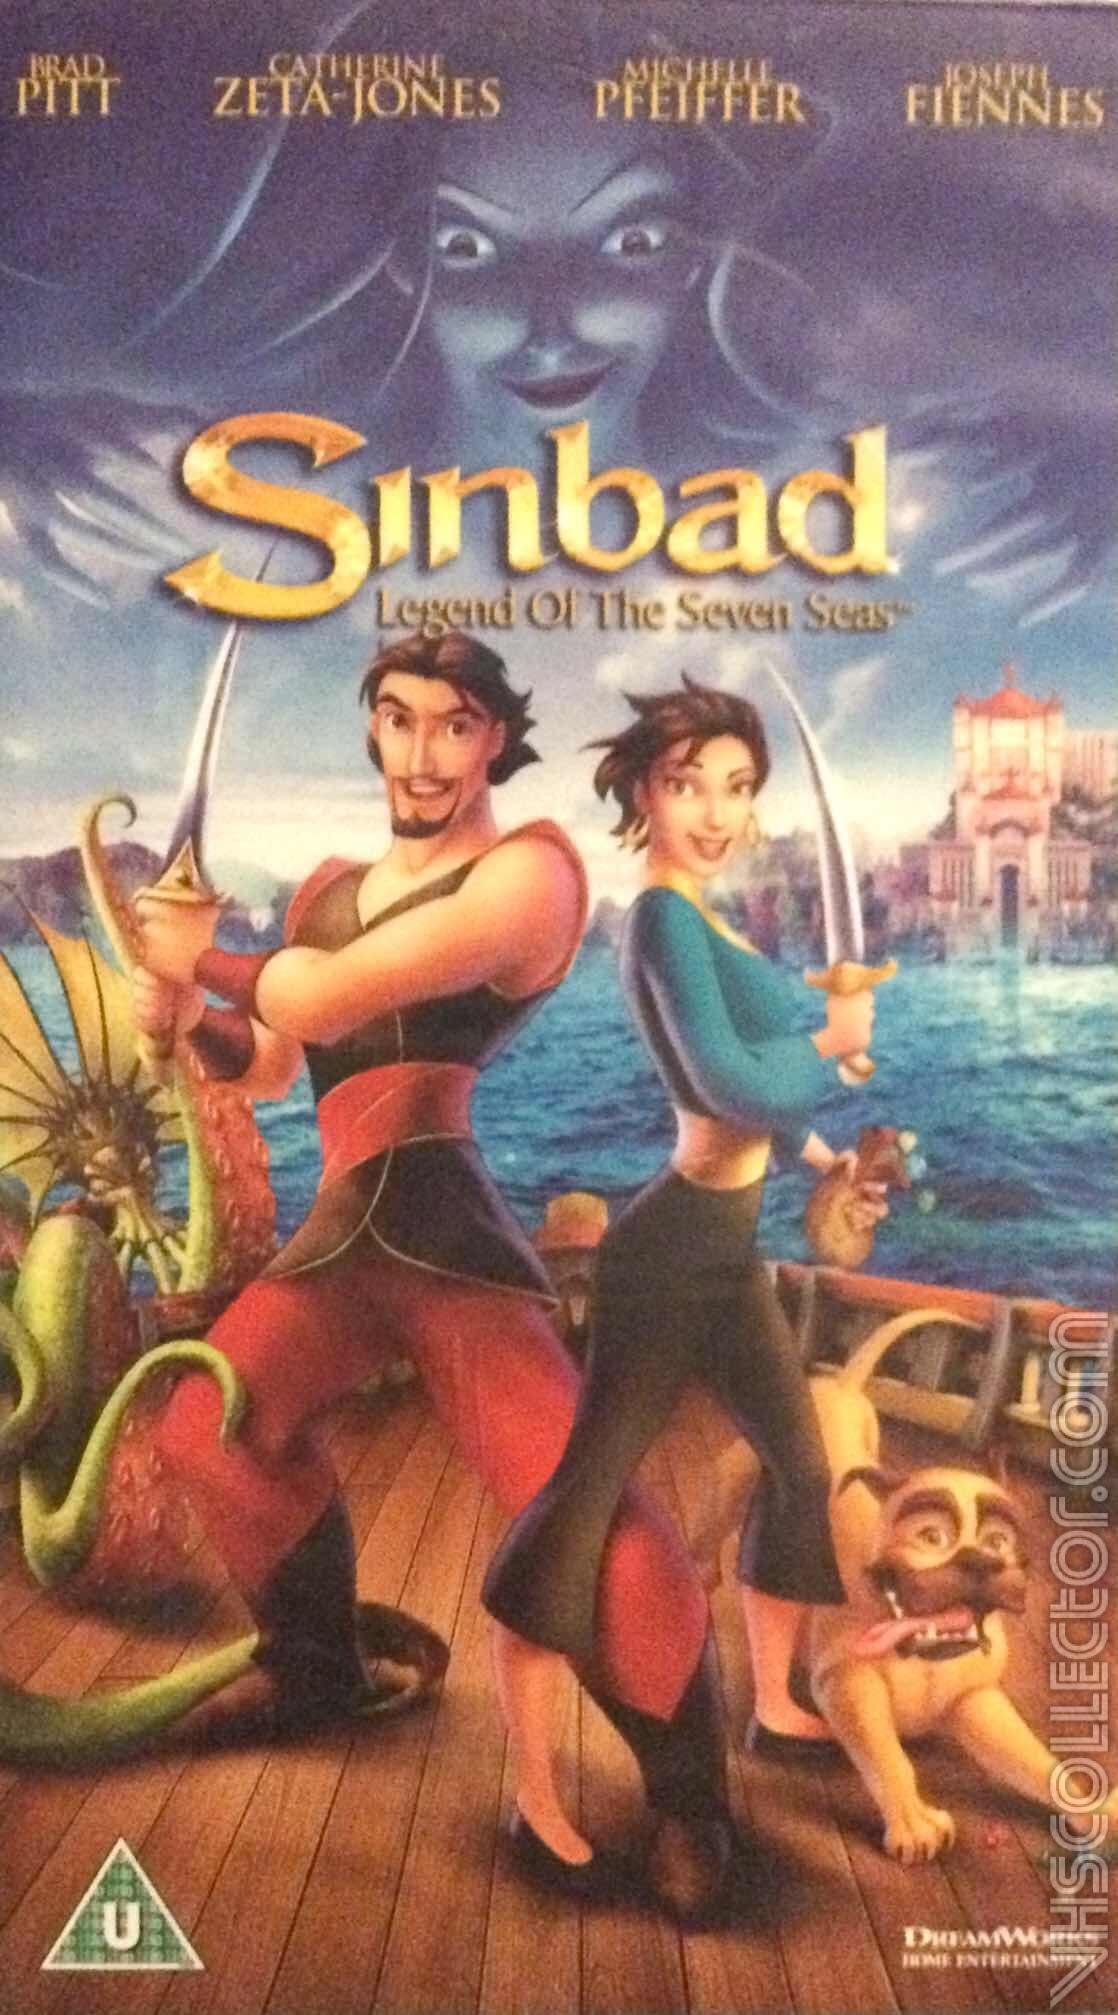 Sinbad Legend of the Seven Seas | VHSCollector.com